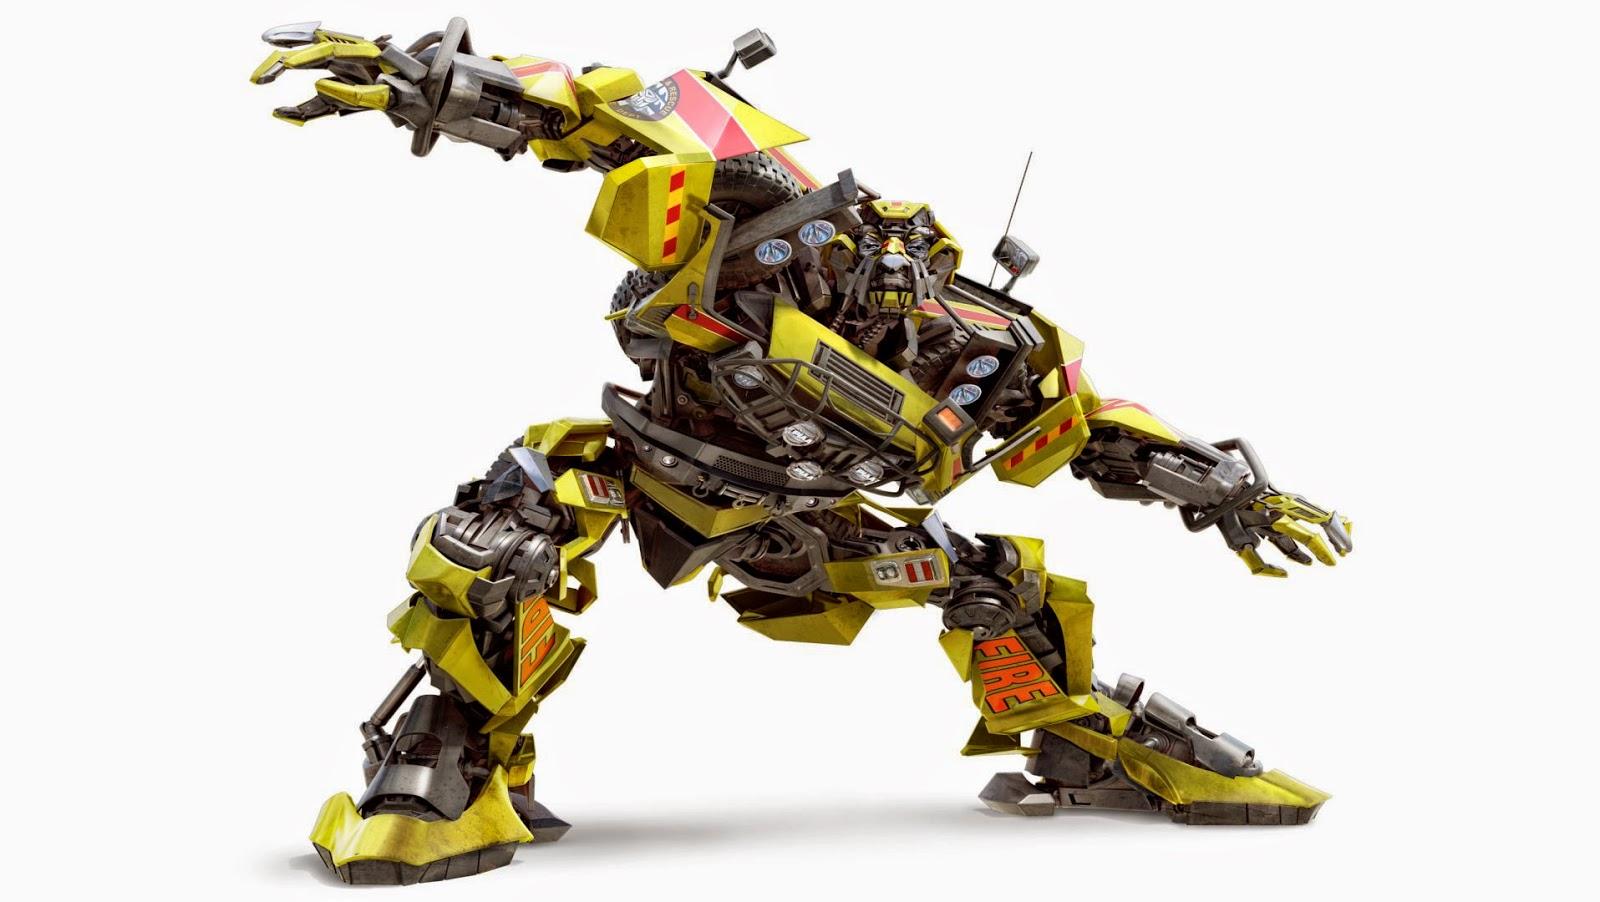 Wallpaper Transformers HD